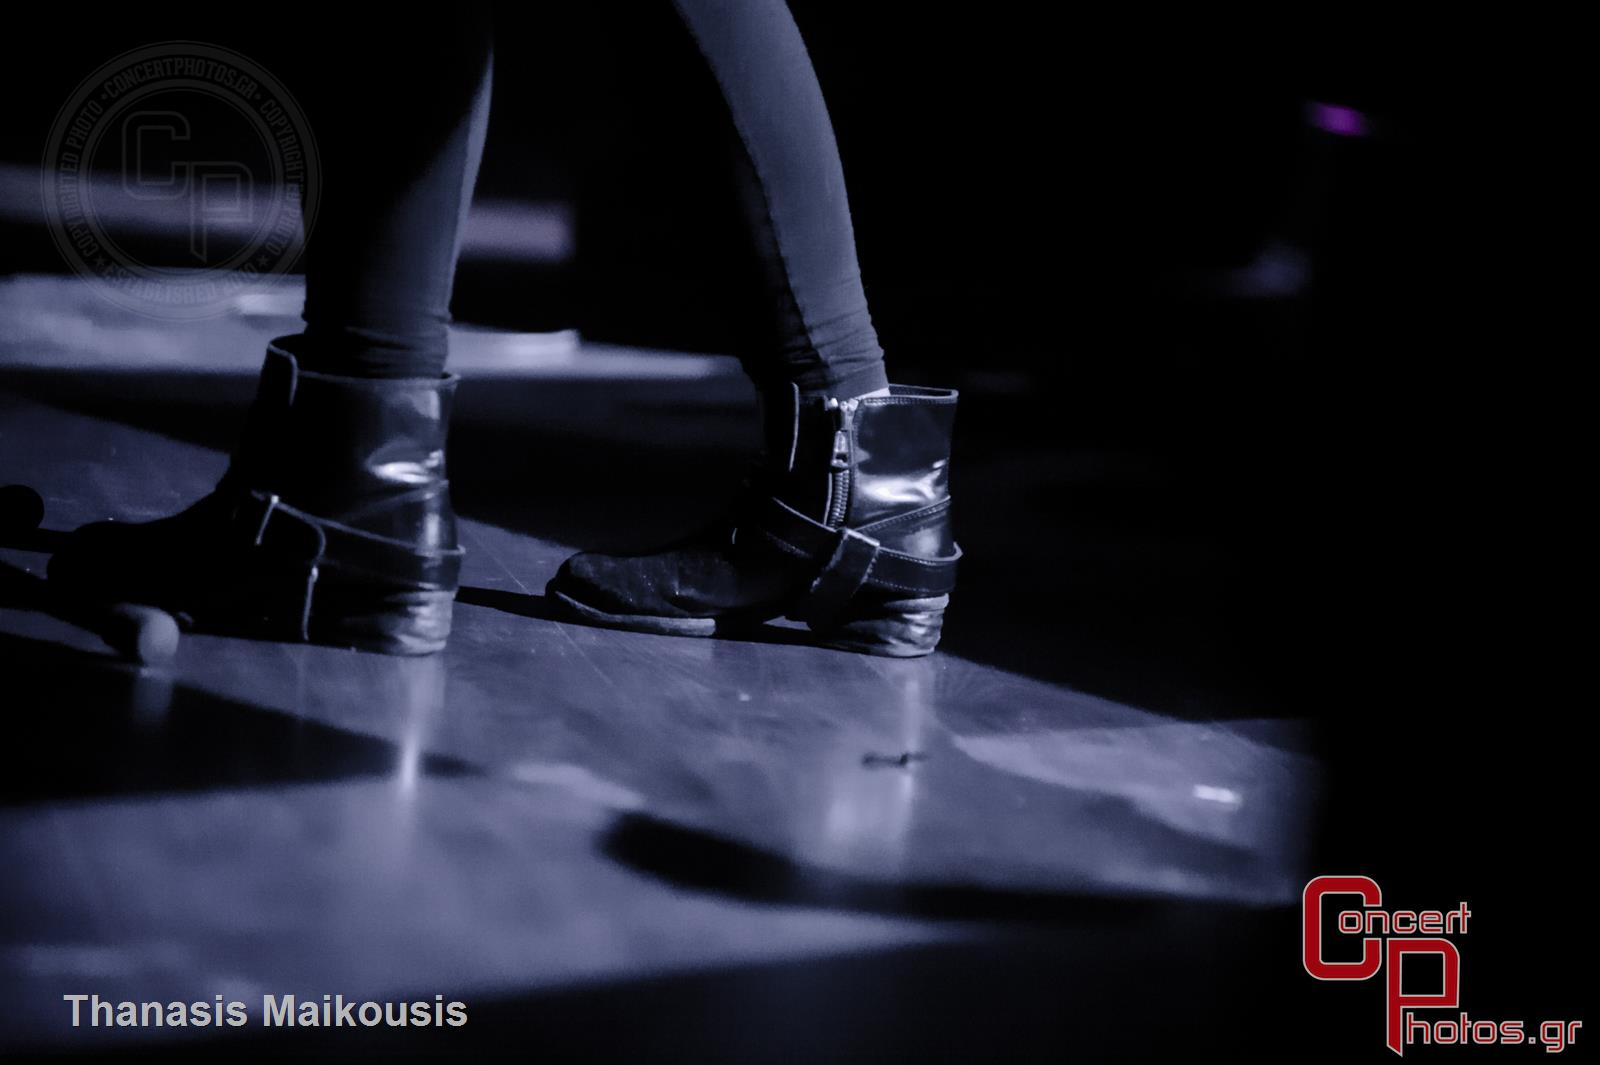 Tricky - Spectralfire-Tricky - Spectralfire photographer: Thanasis Maikousis - concertphotos_-3907